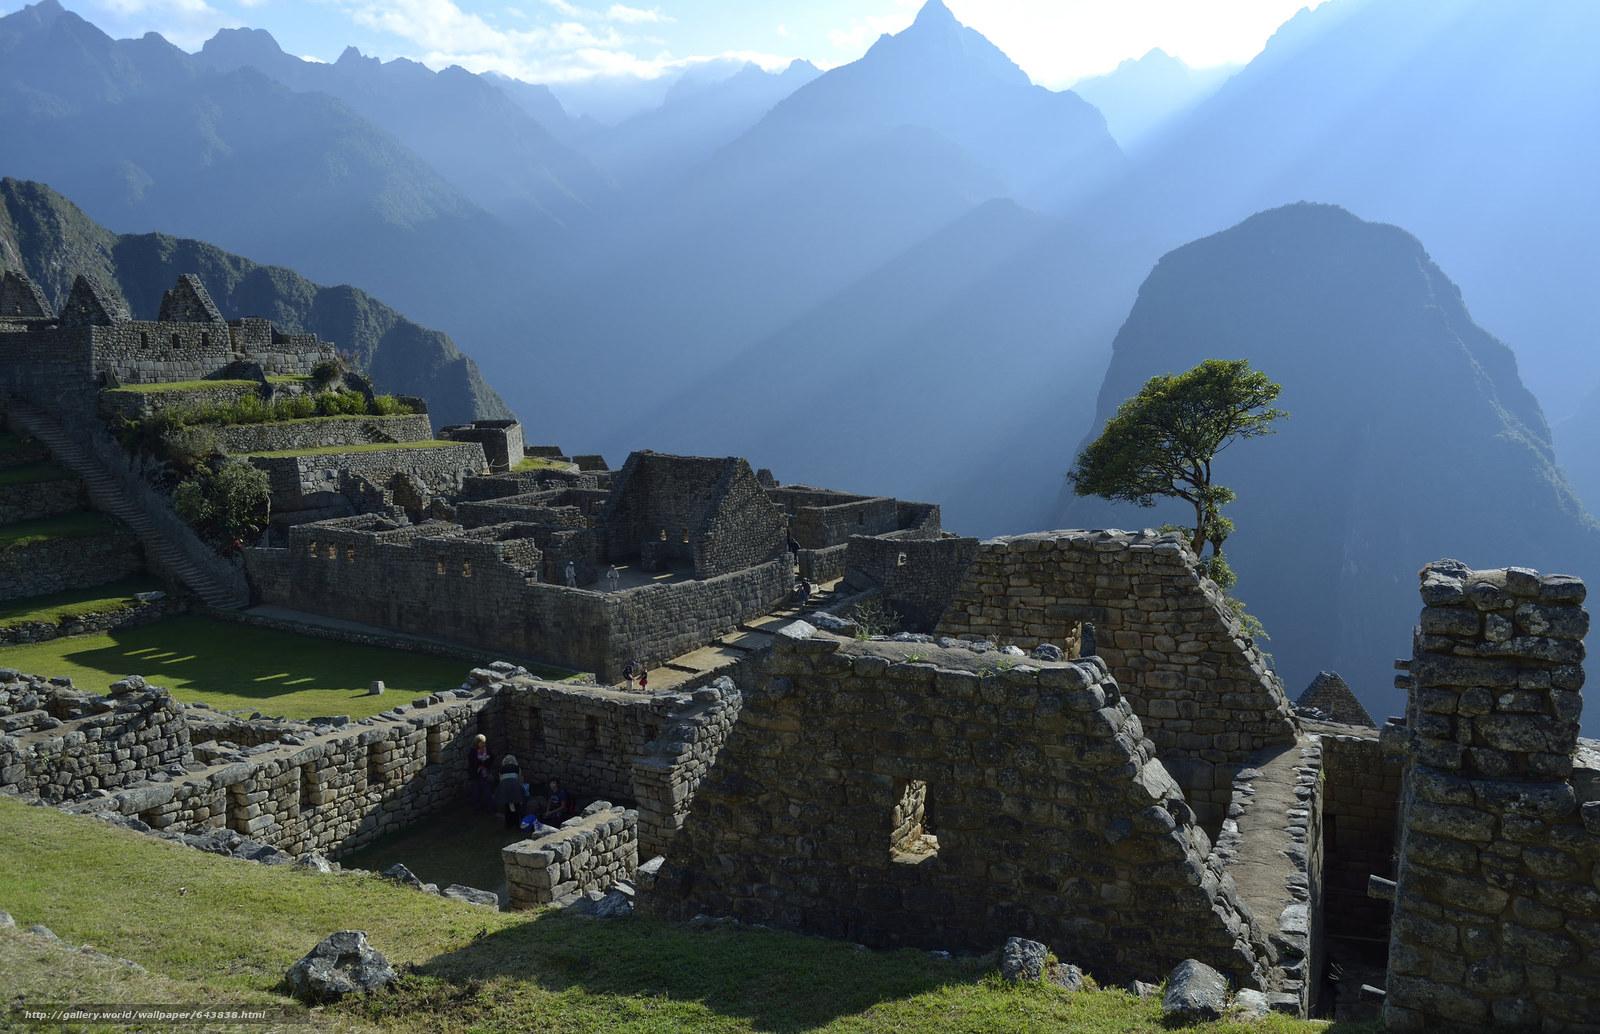 Download wallpaper Machu Picchu,  Peru,  South America,  architecture free desktop wallpaper in the resolution 2048x1324 — picture №643838